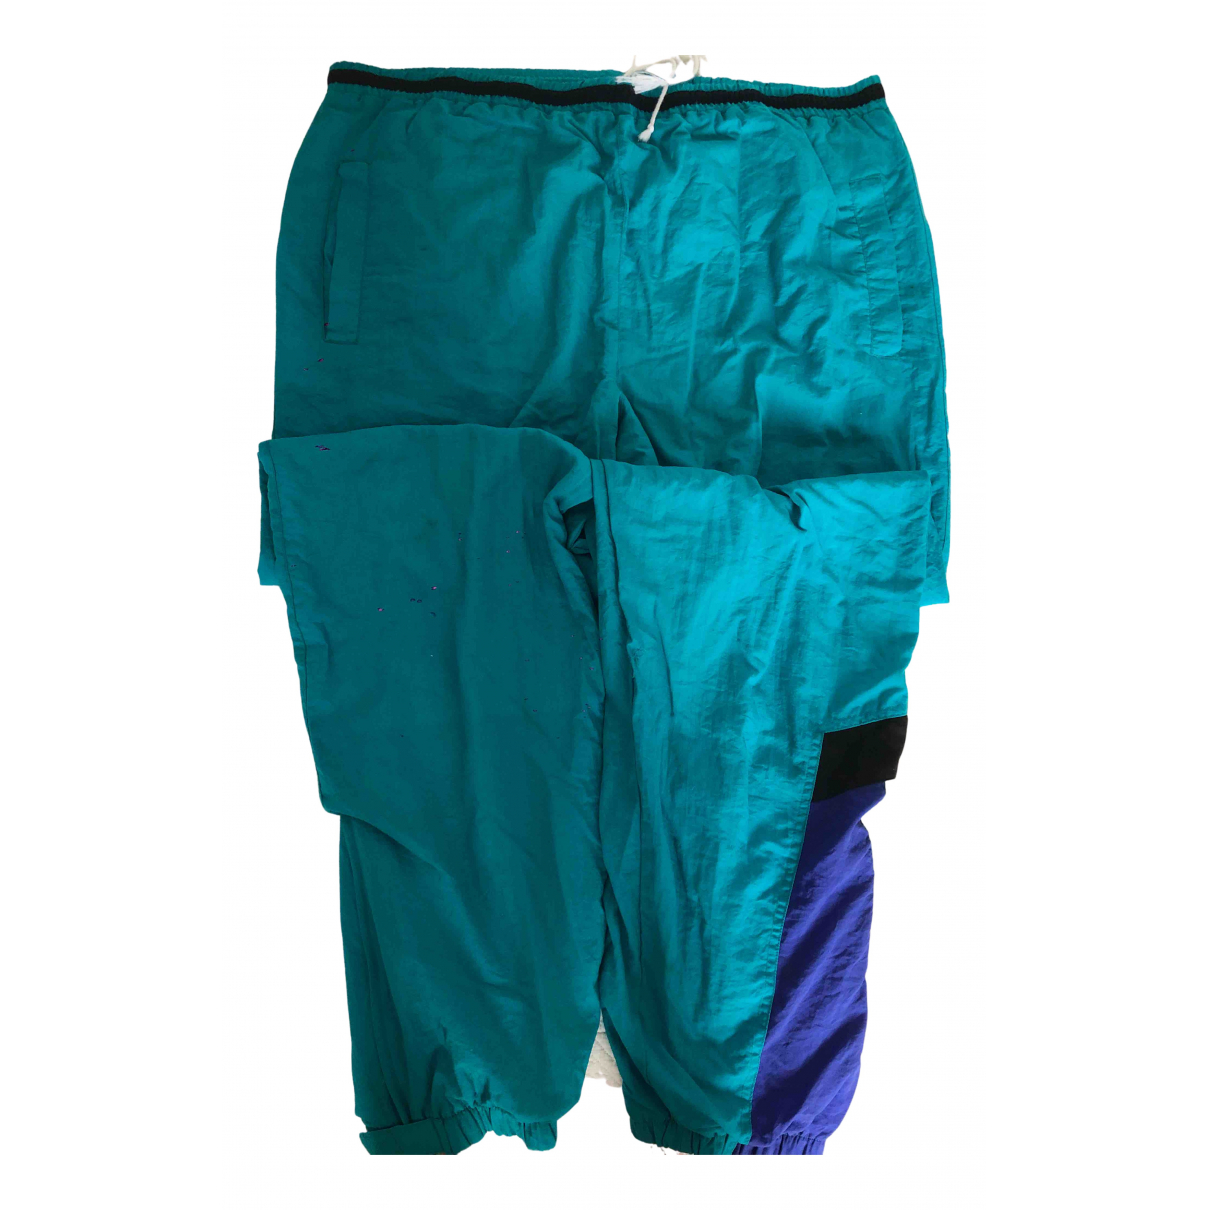 Pantalon en Poliester Turquesa Non Signe / Unsigned